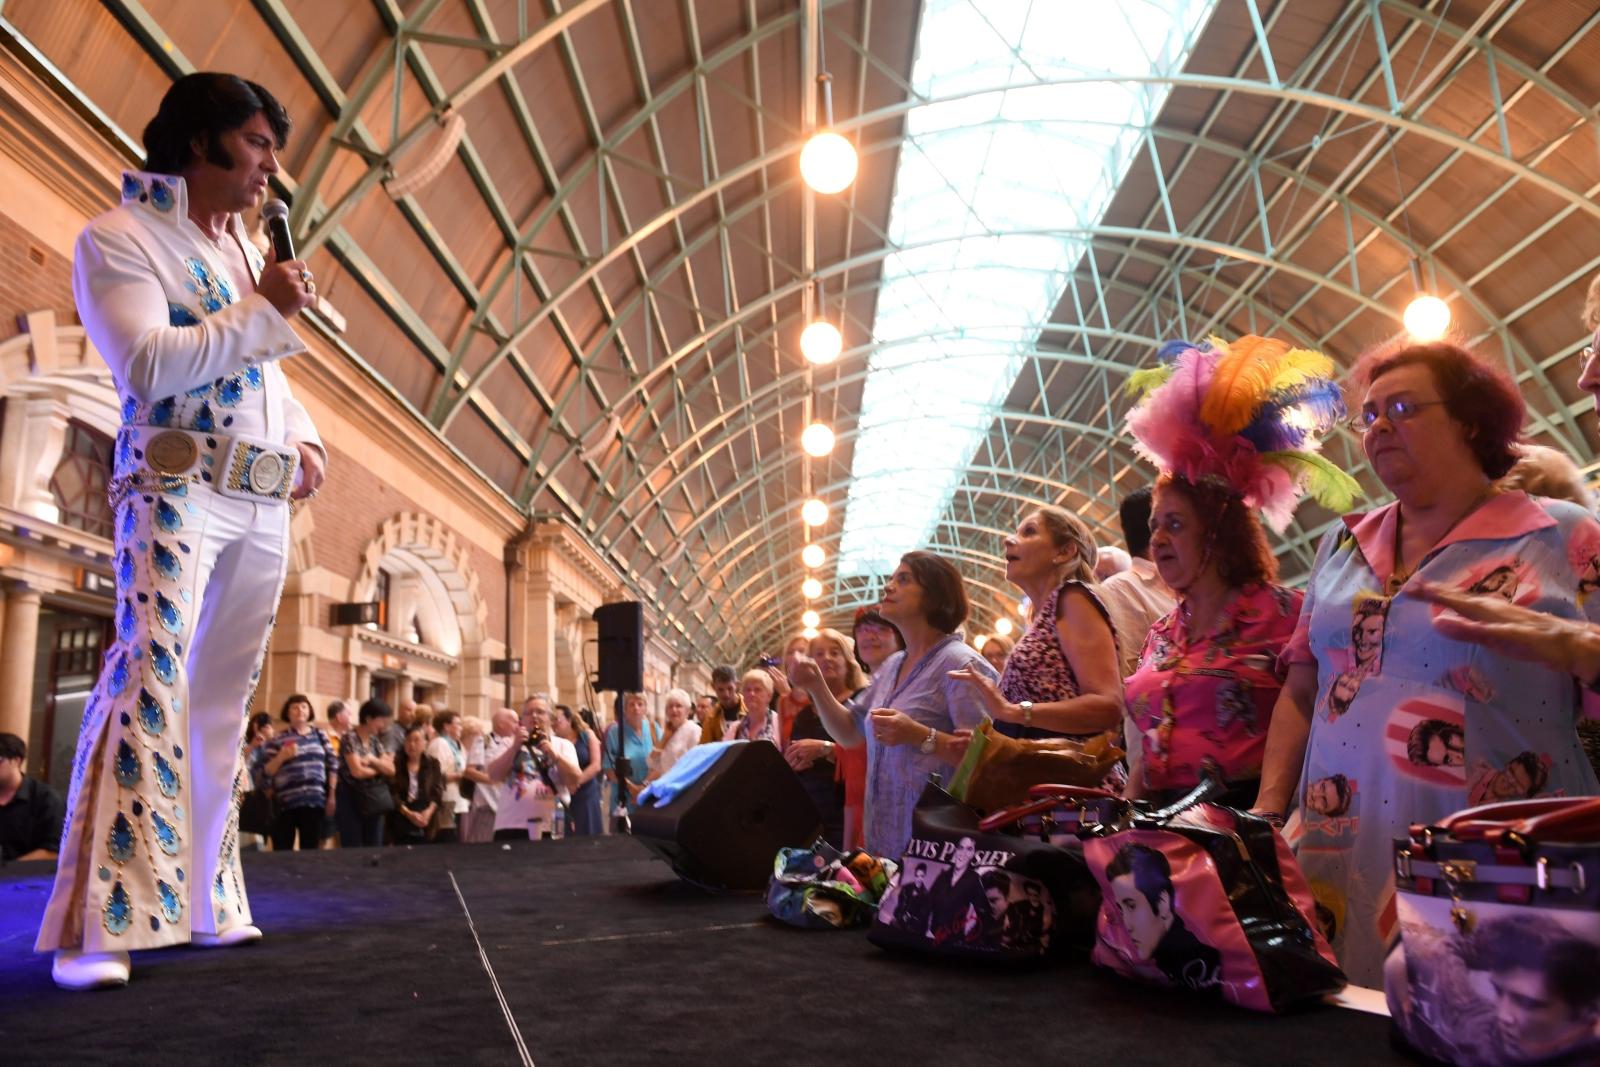 Festiwal Elvisa Presley'a w Australii. Fot. PAP/EPA/DEAN LEWINS  AUSTRALIA AND NEW ZEALAND OUT